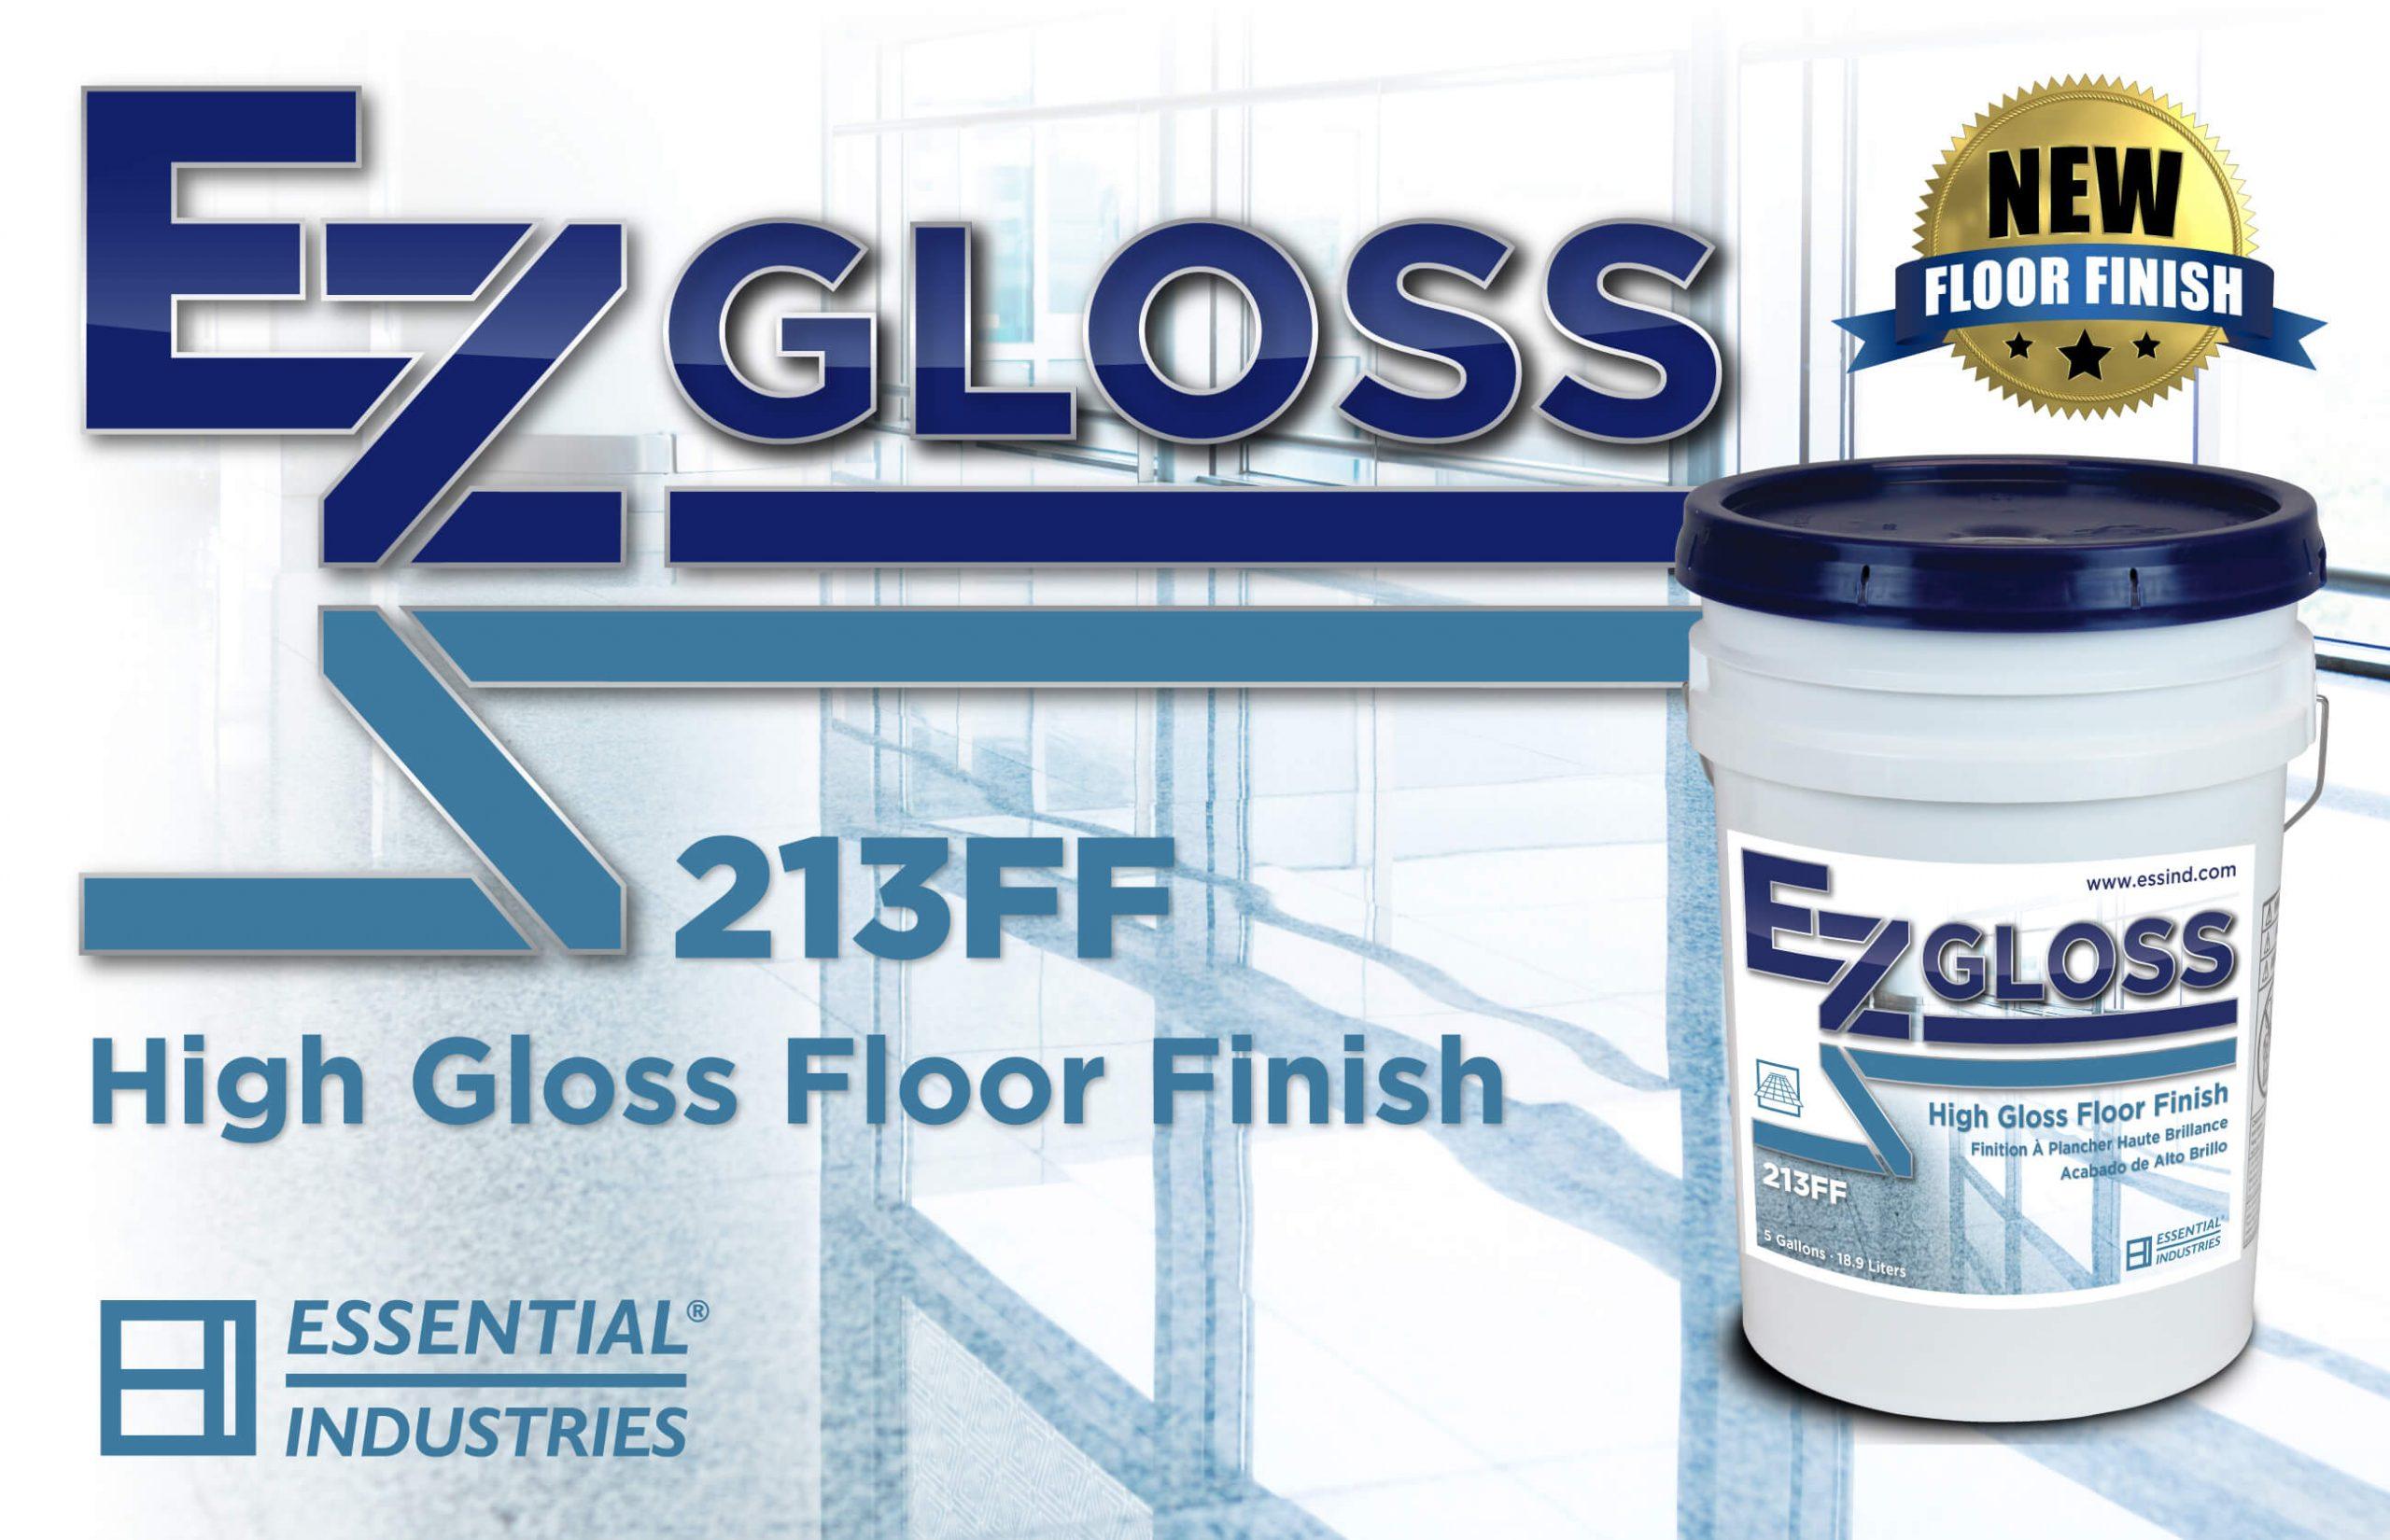 Introducing EZ Gloss High Gloss Floor Finish